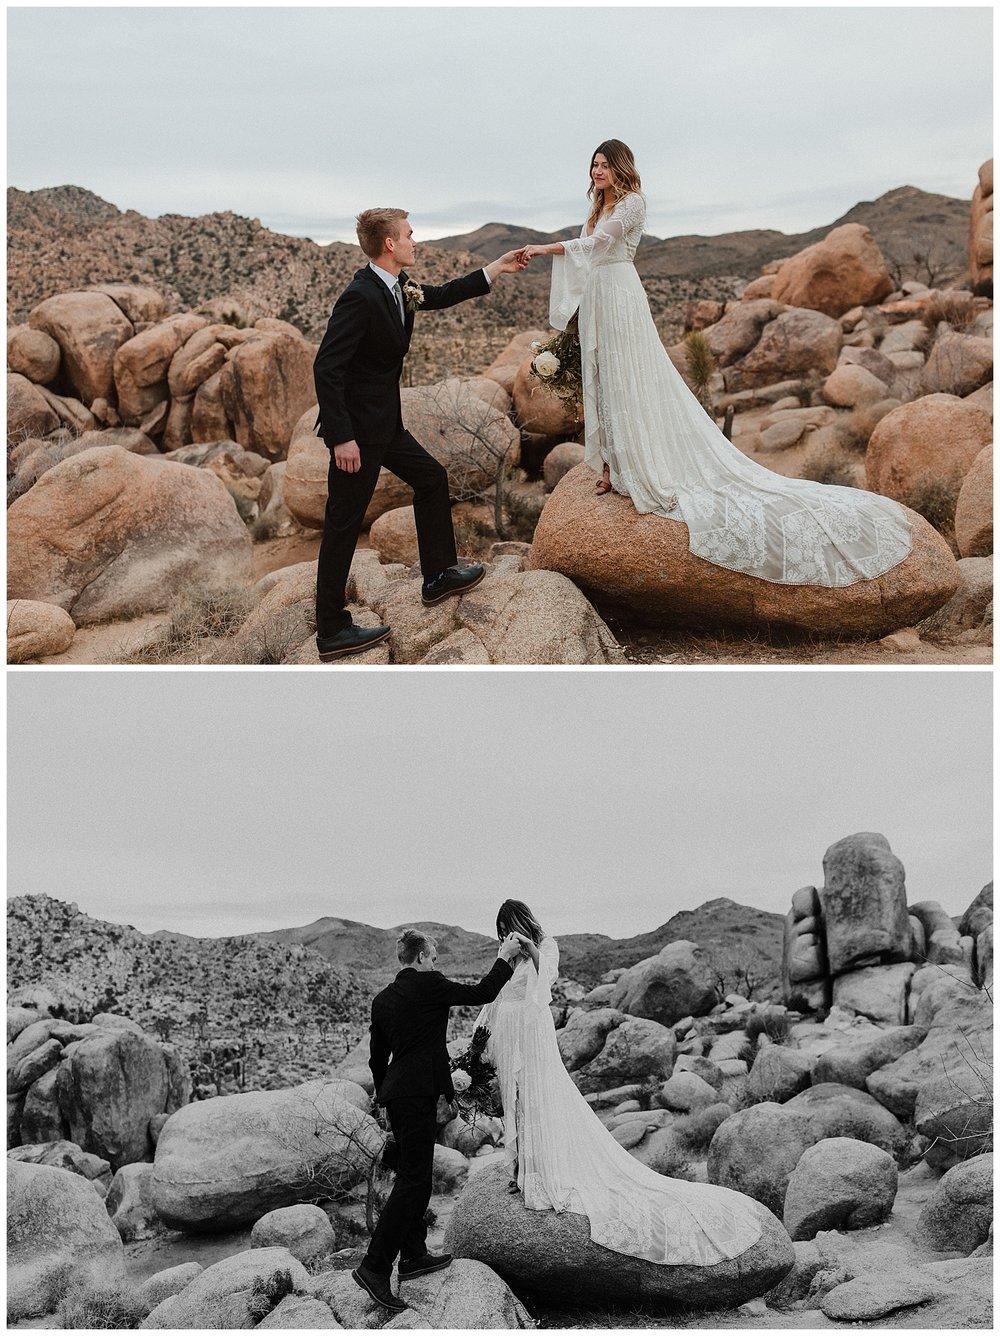 romantic_elopement_joshua_tree_adventurous_wedding_photographer_romantic_intimate_wedding_0010.jpg